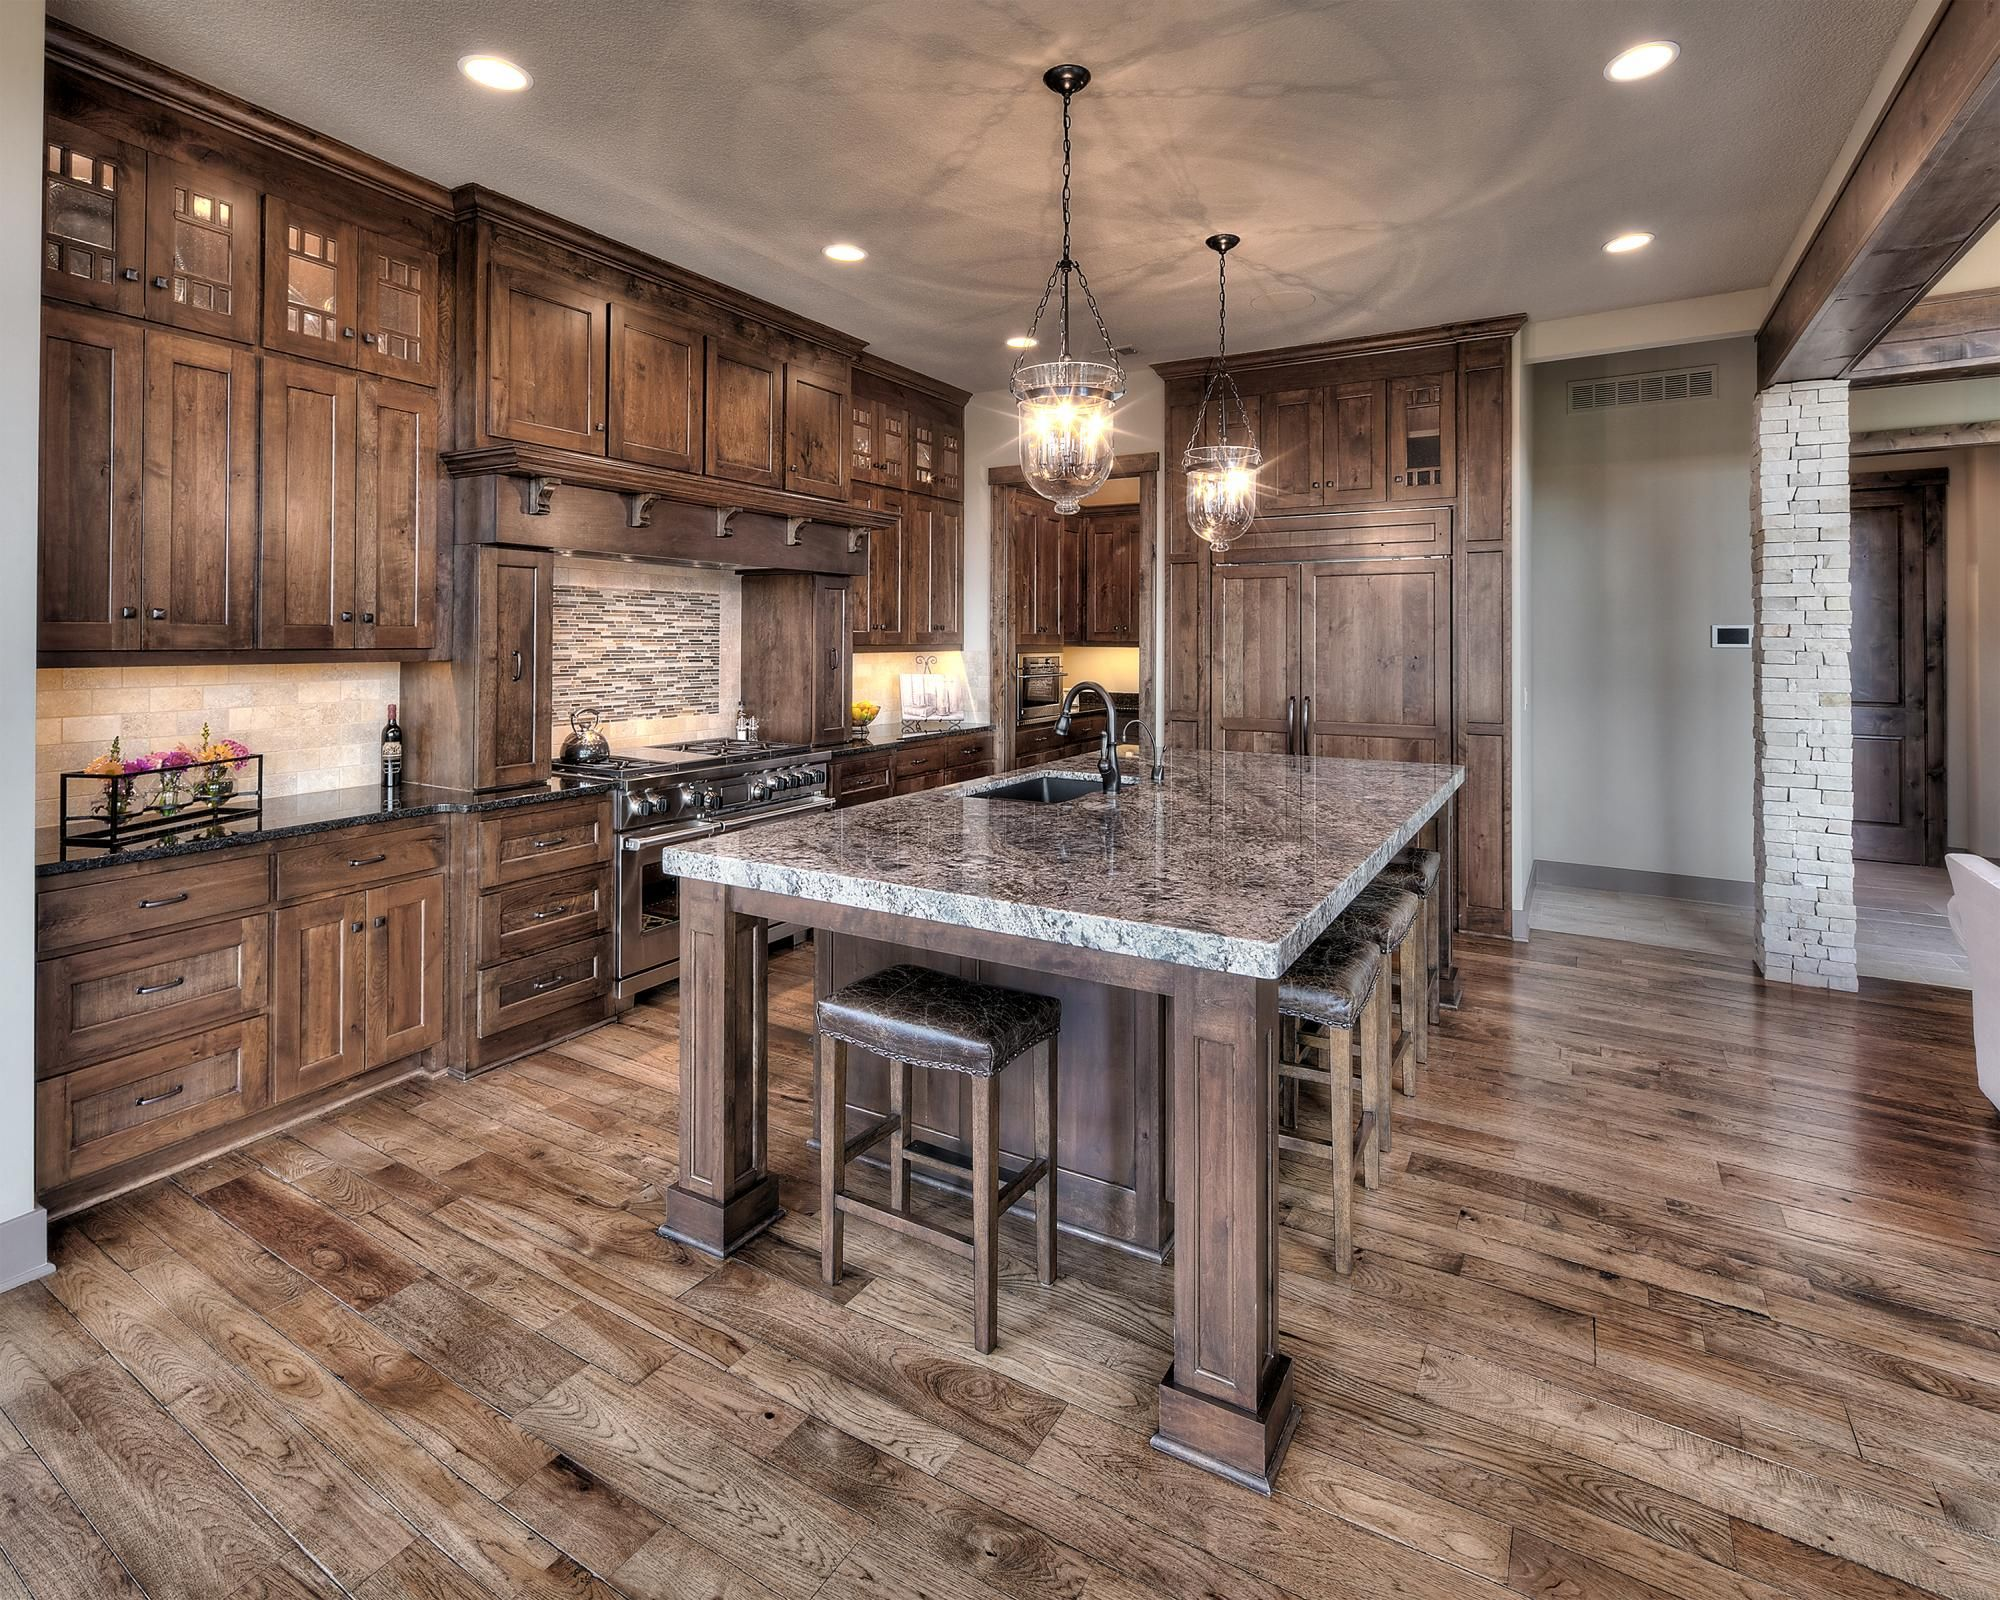 The Aspen Ridge Reverse Custom Homes In Kansas City Ks Starr Homes Rustic Farmhouse Kitchen Rustic Kitchen Design Rustic Kitchen Cabinets